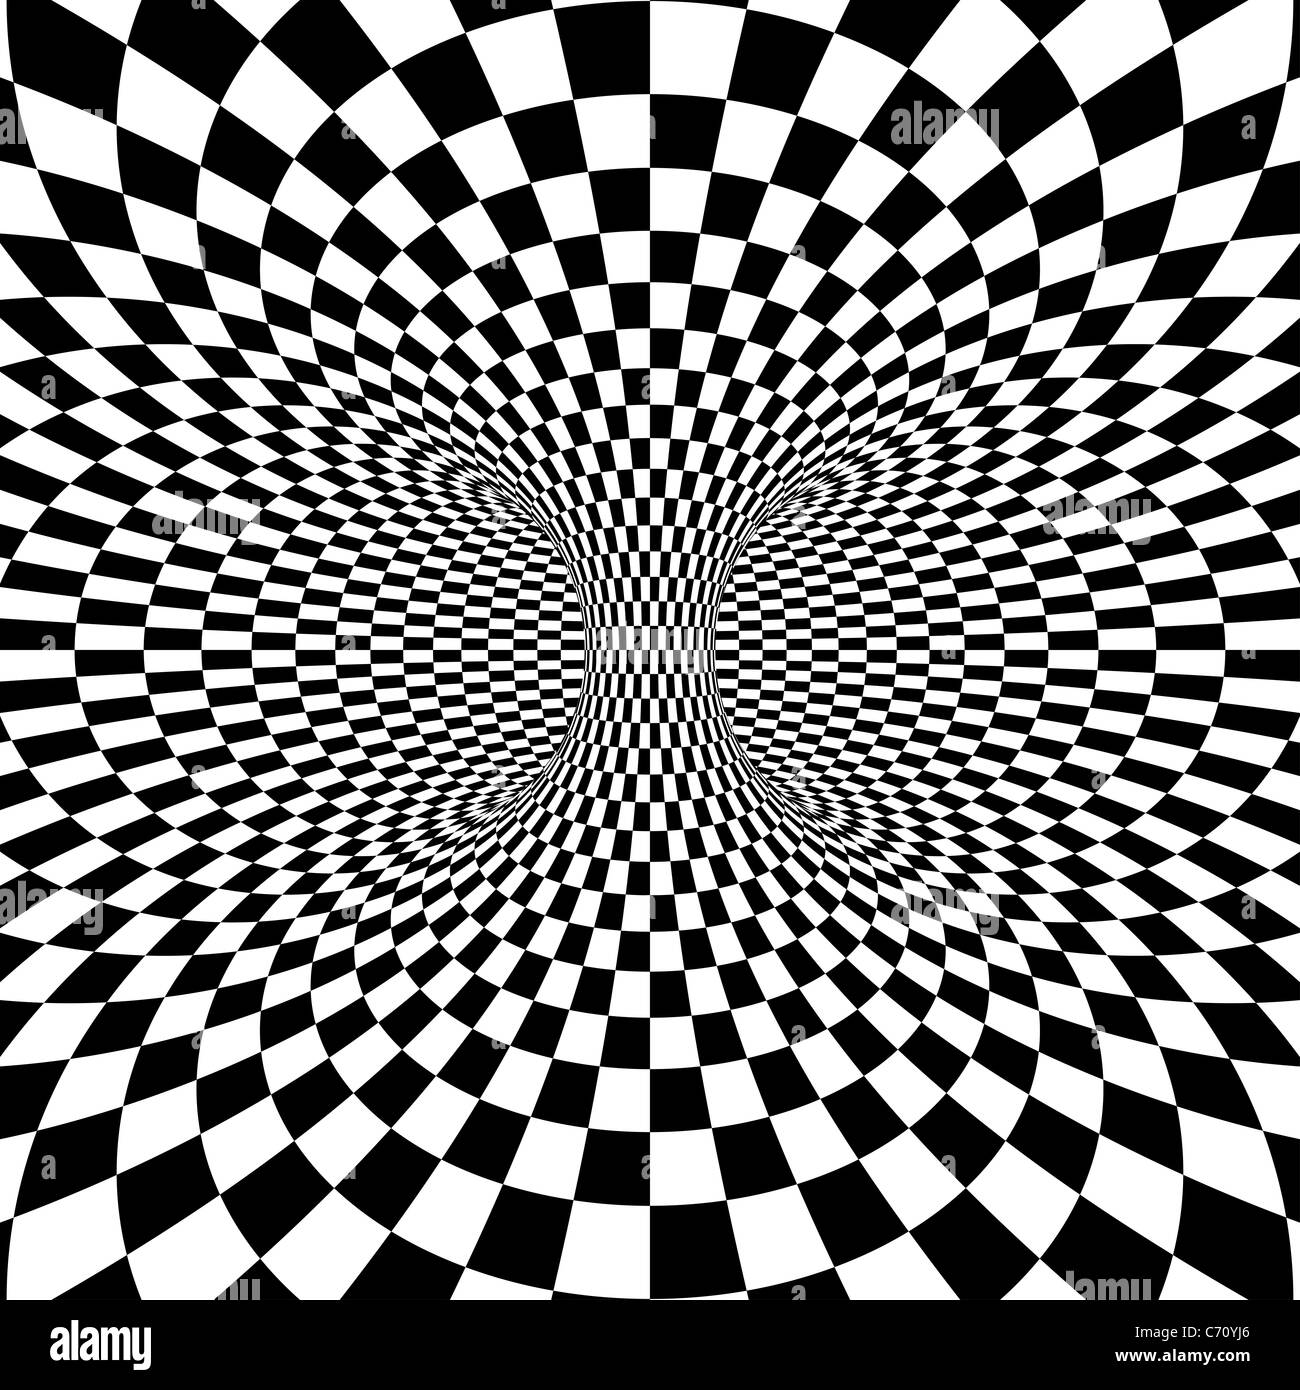 Optical illusion black and white stock photos images alamy optical illusion background stock image reviewsmspy